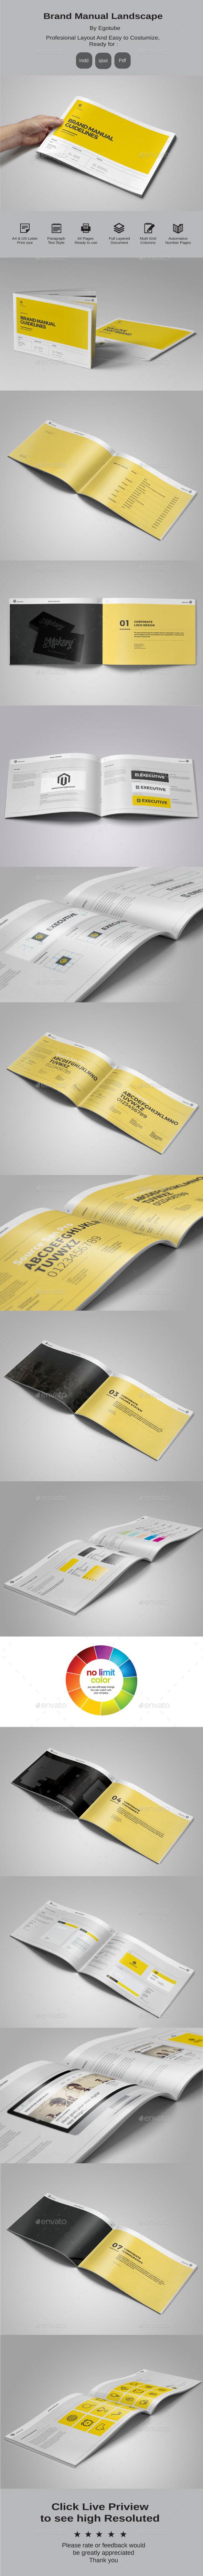 Brand Manual Landscape Template InDesign INDD. Download here: http ...